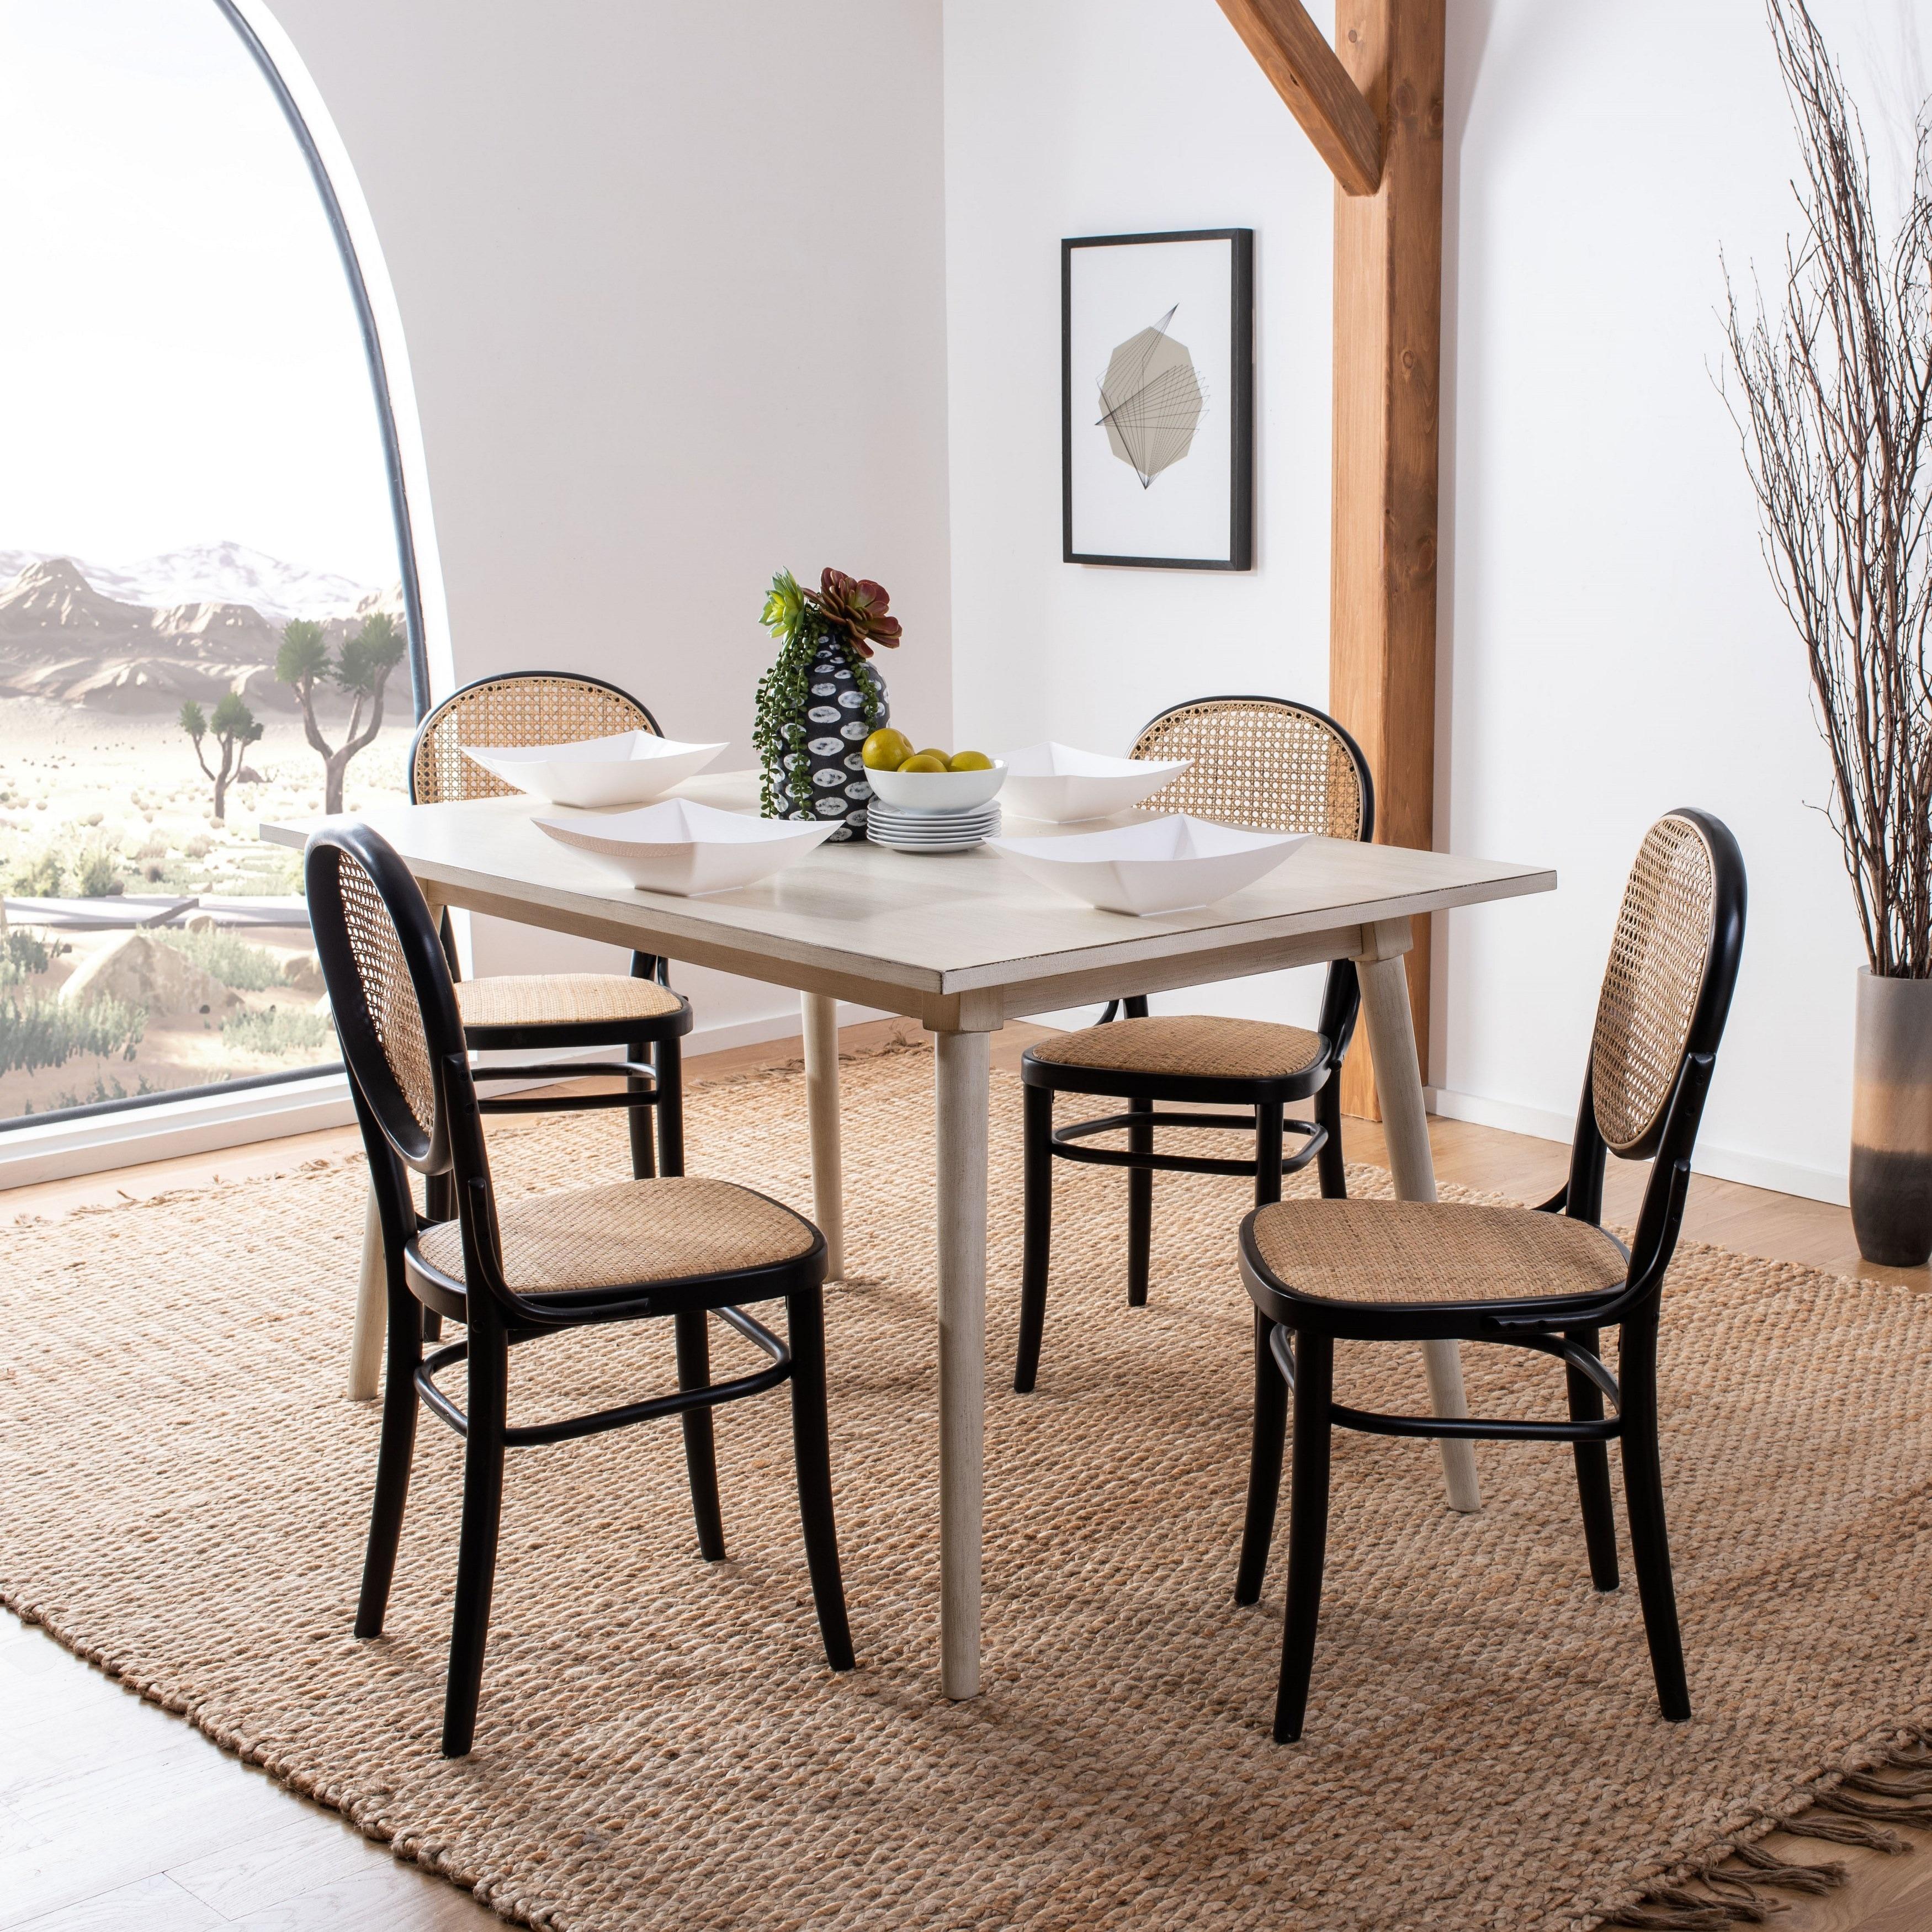 "Safavieh Sonia Modern Natural Cane Dining Chair (Set of 122) - 12122.12"" x 125.12""  x 122.12"""